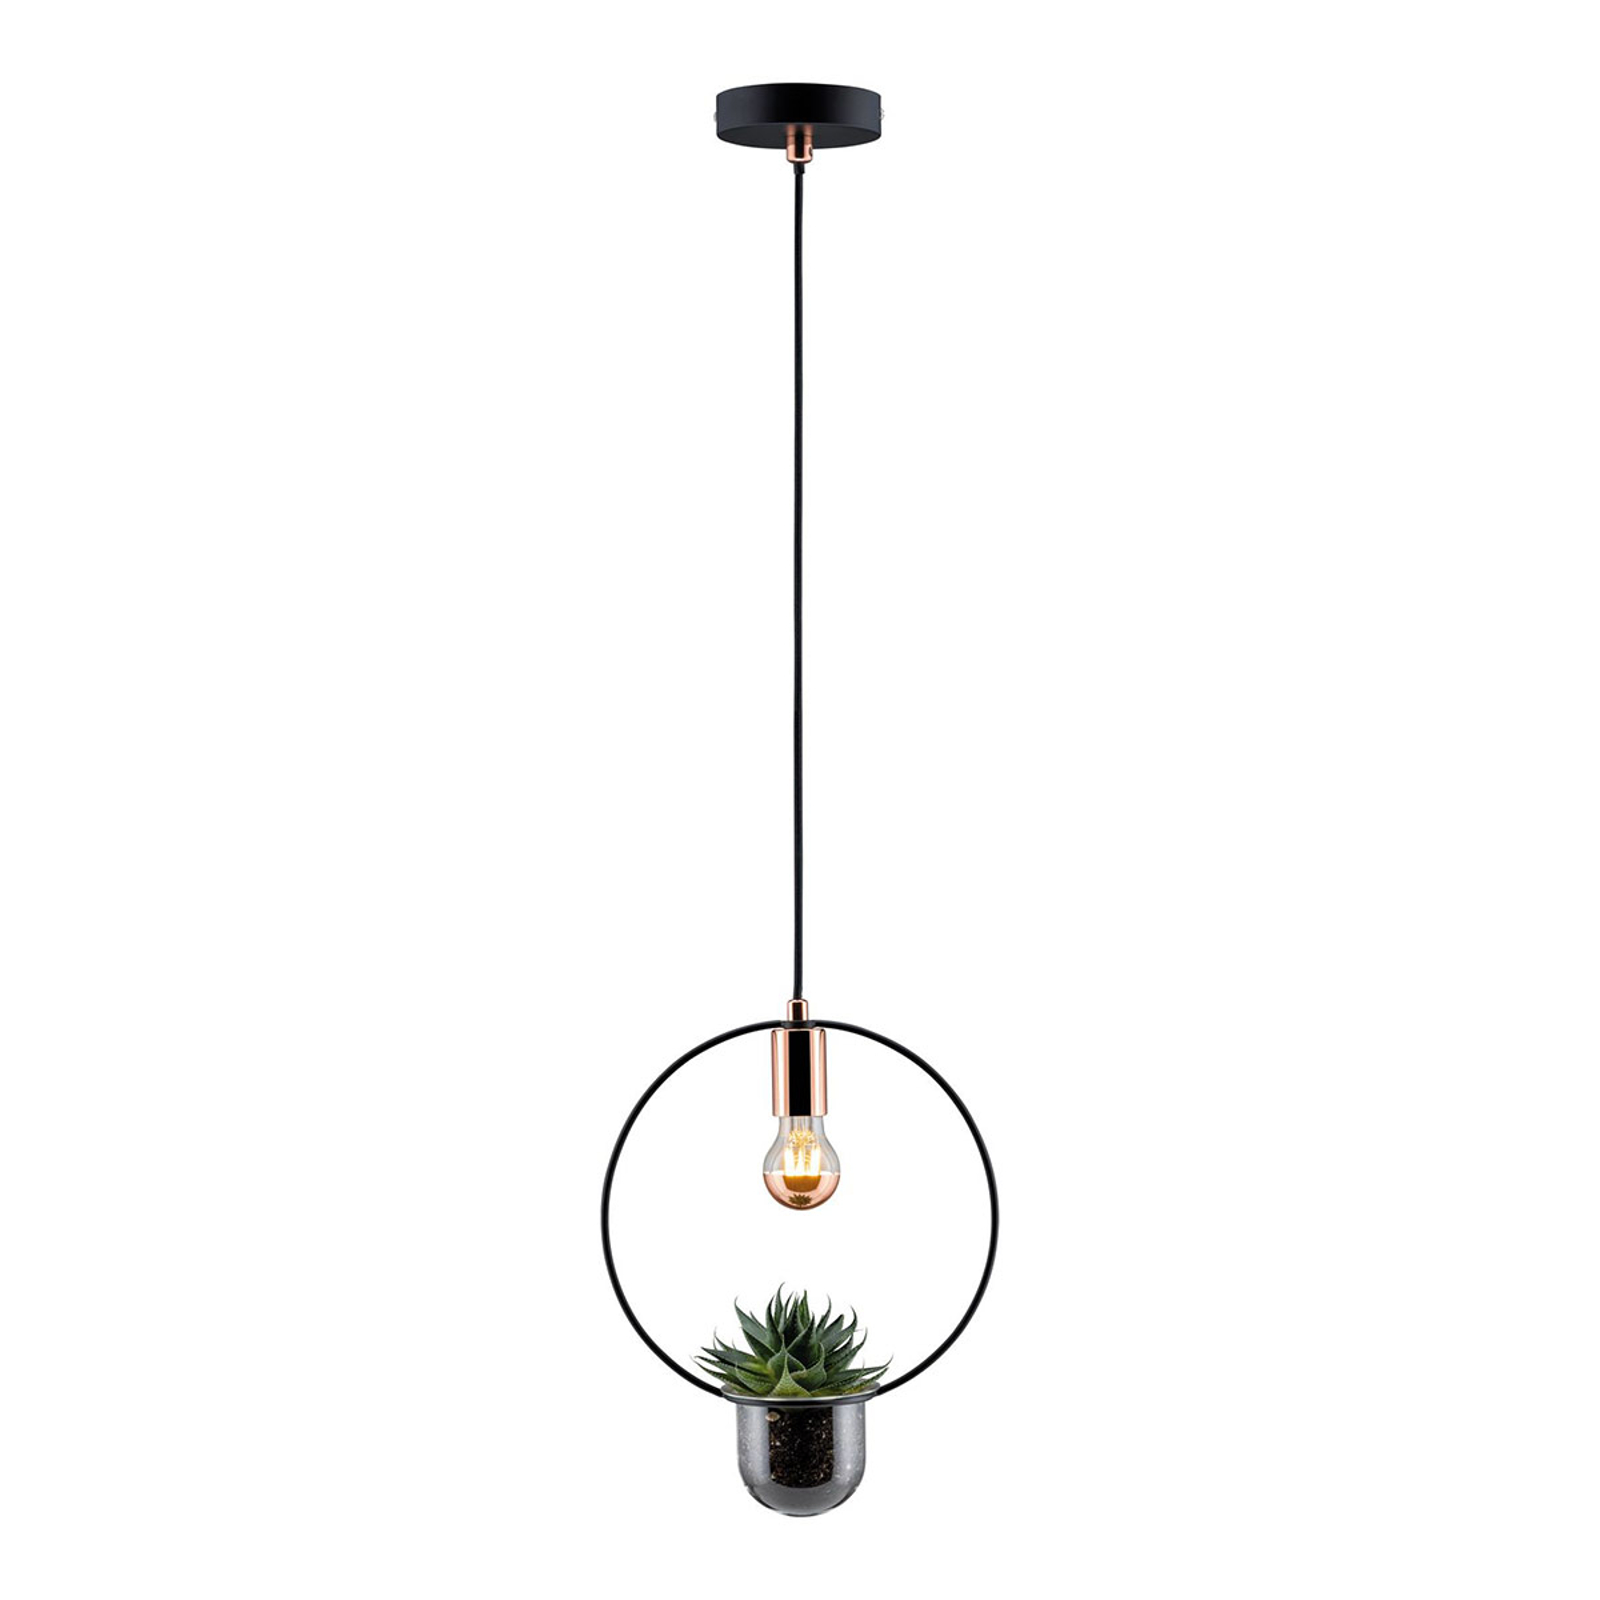 Paulmann hanglamp Tasja met plantenbak